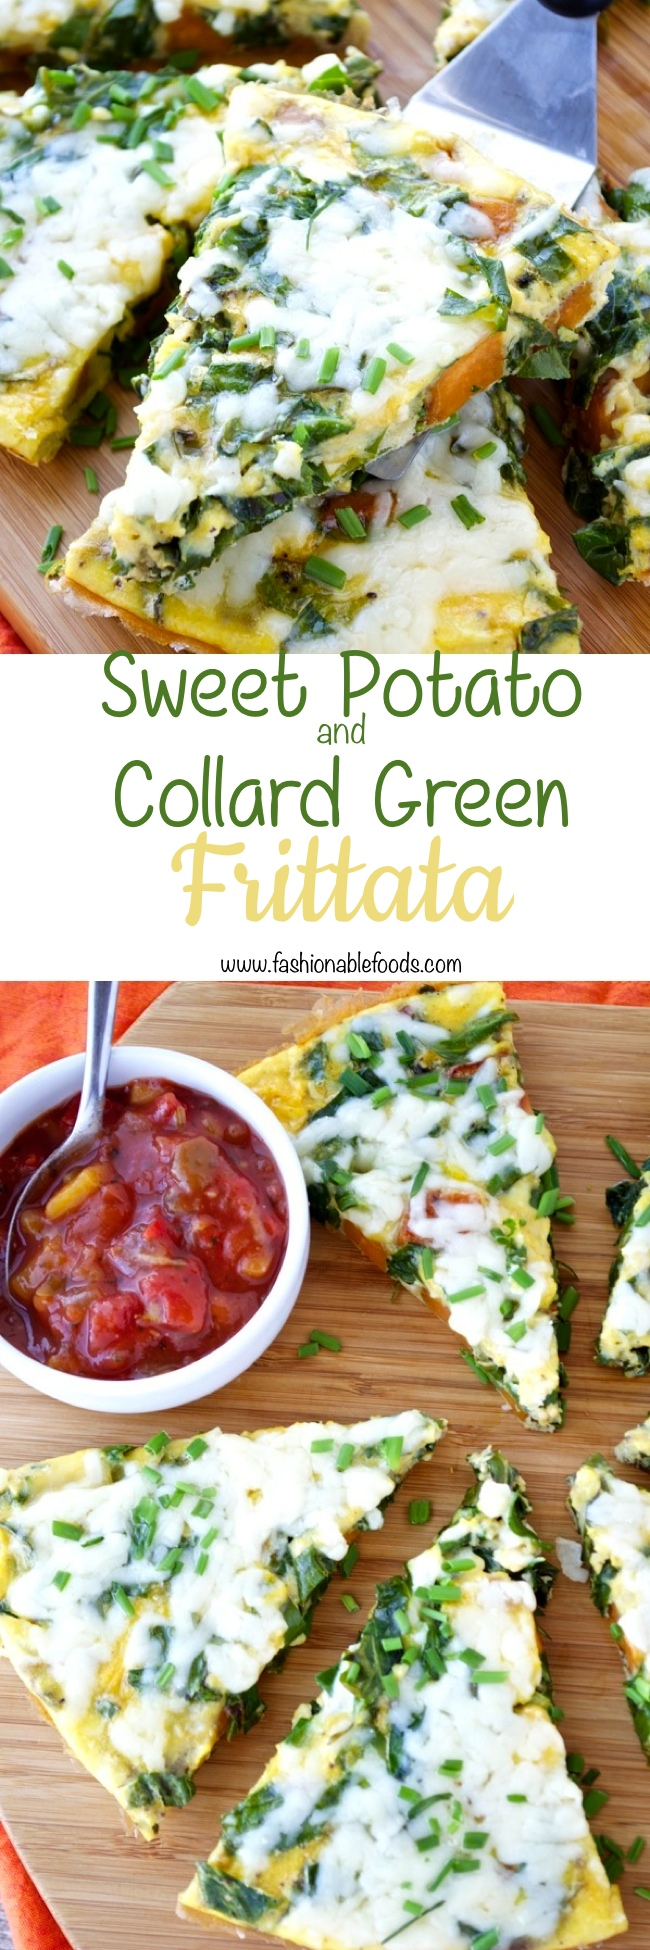 Sweet Potato and Collard Green Frittata Pin